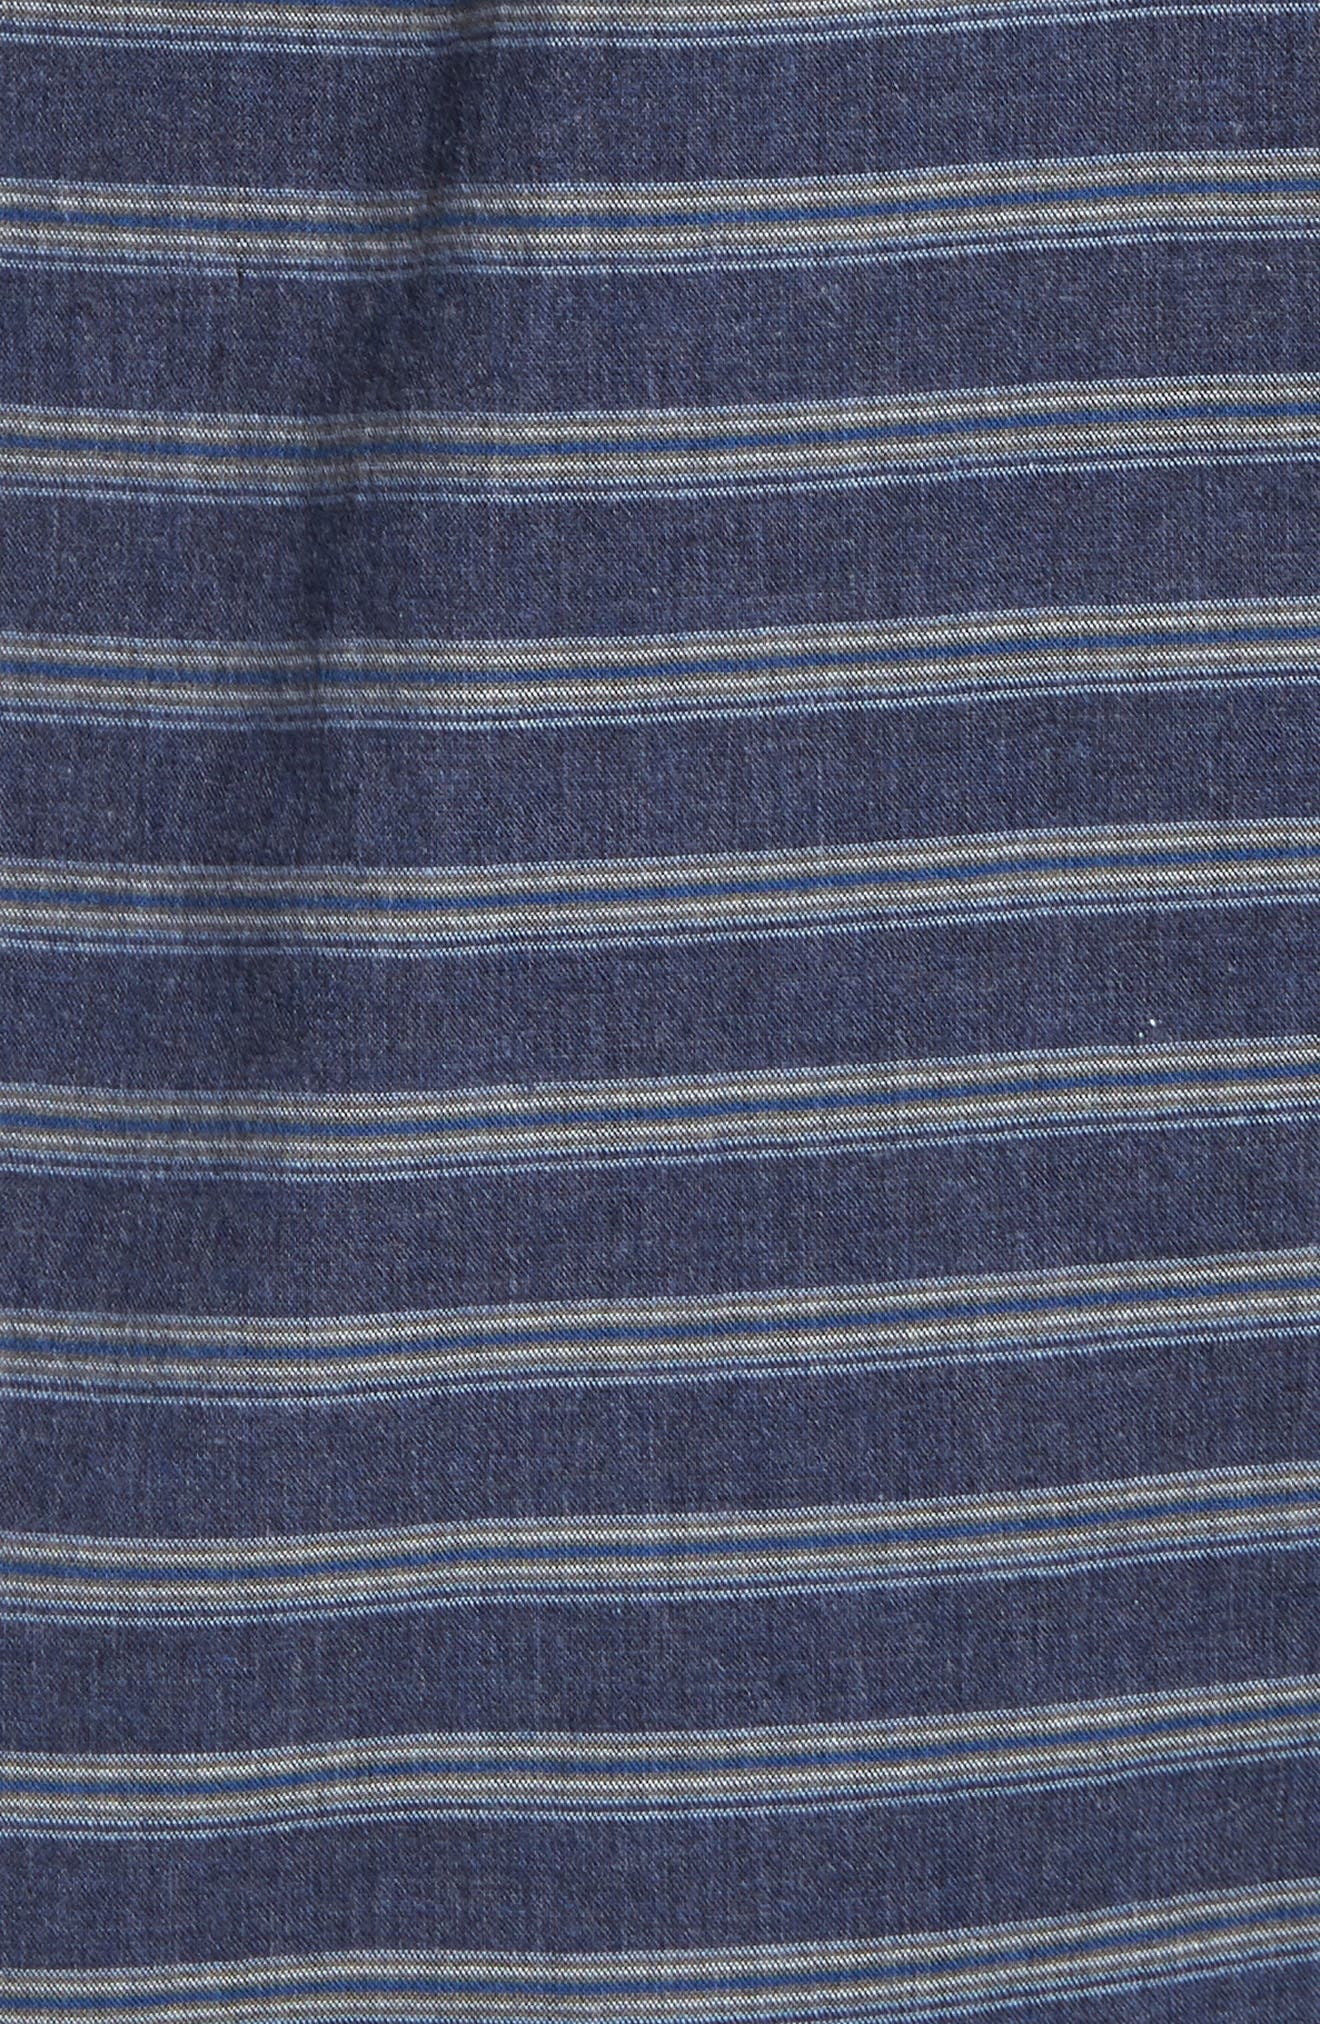 Stag Short Sleeve Shirt,                             Alternate thumbnail 5, color,